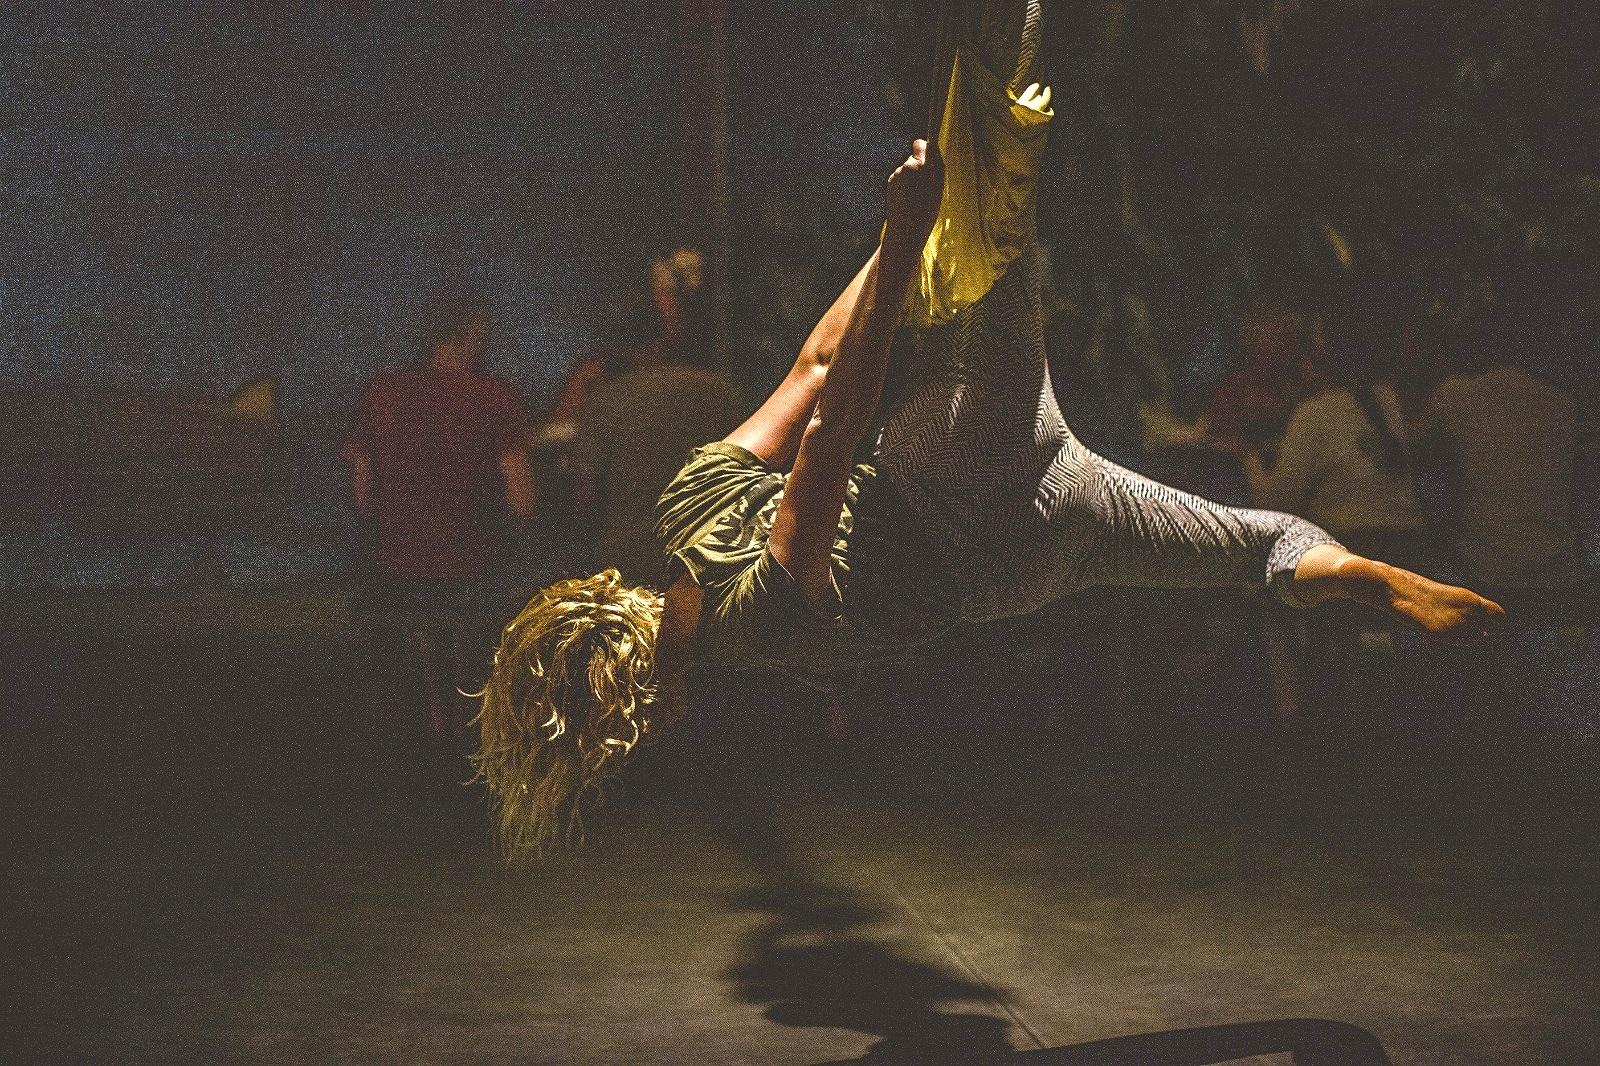 aerial-yoga-retreat-venue-costa-rica-experience-retreats.jpg